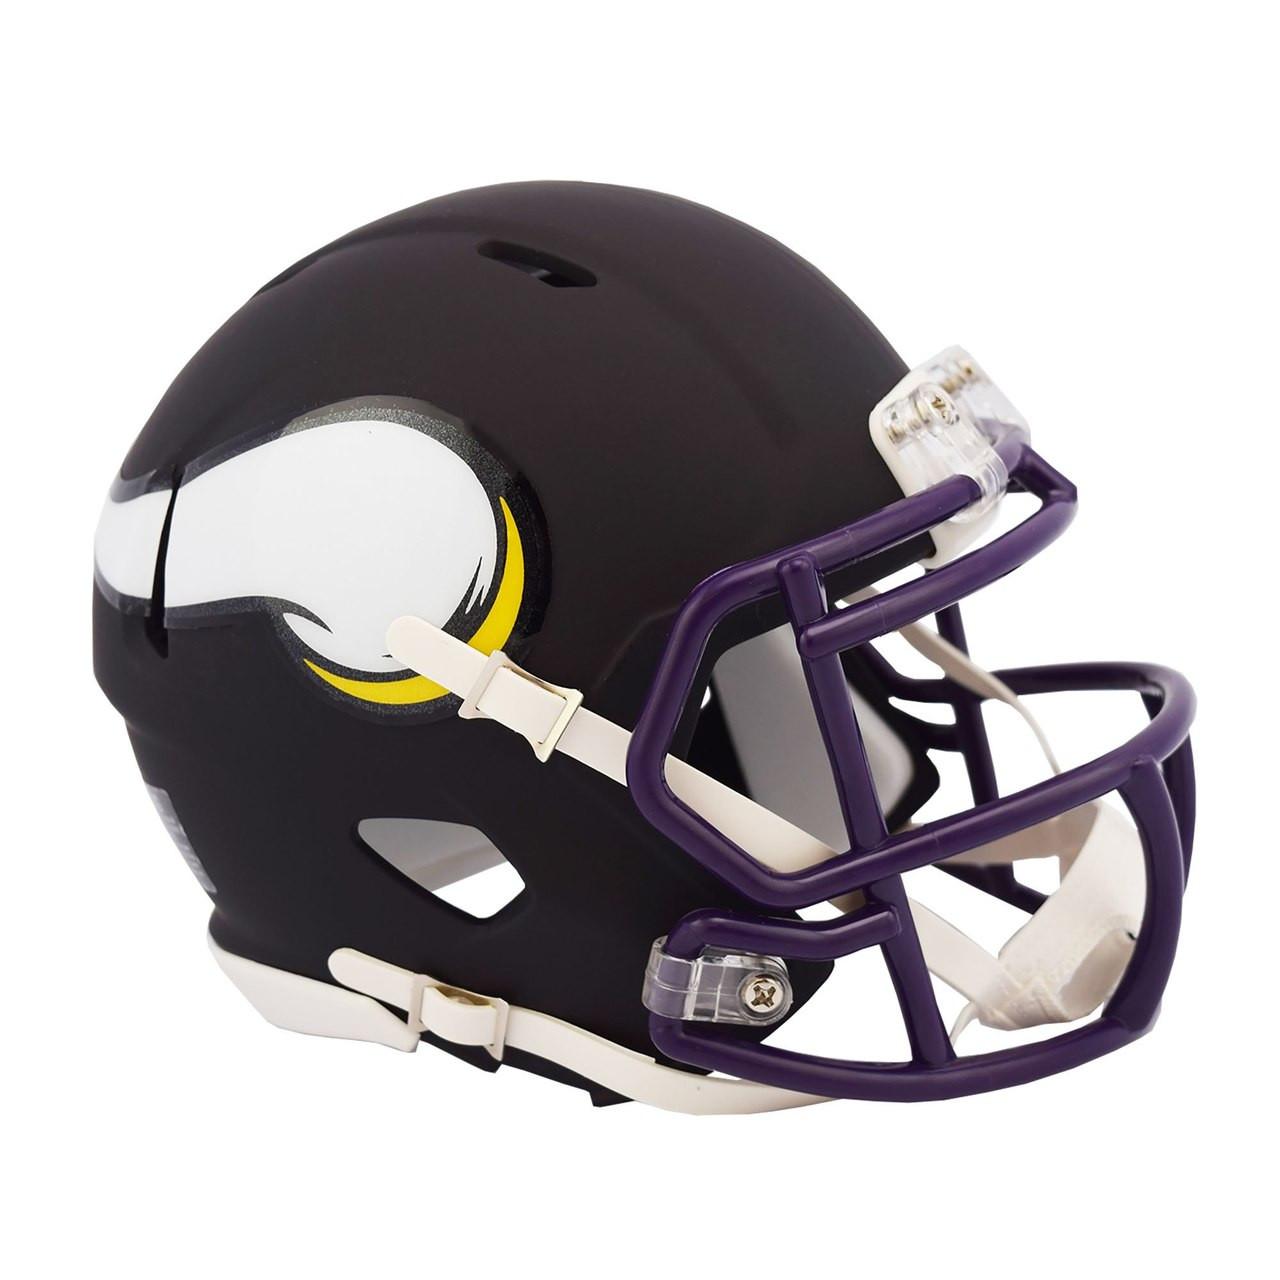 fa8acc5deb68e5 Riddell Minnesota Vikings Black Matte Alternate Speed Mini Football Helmet.  Riddell. Image 1